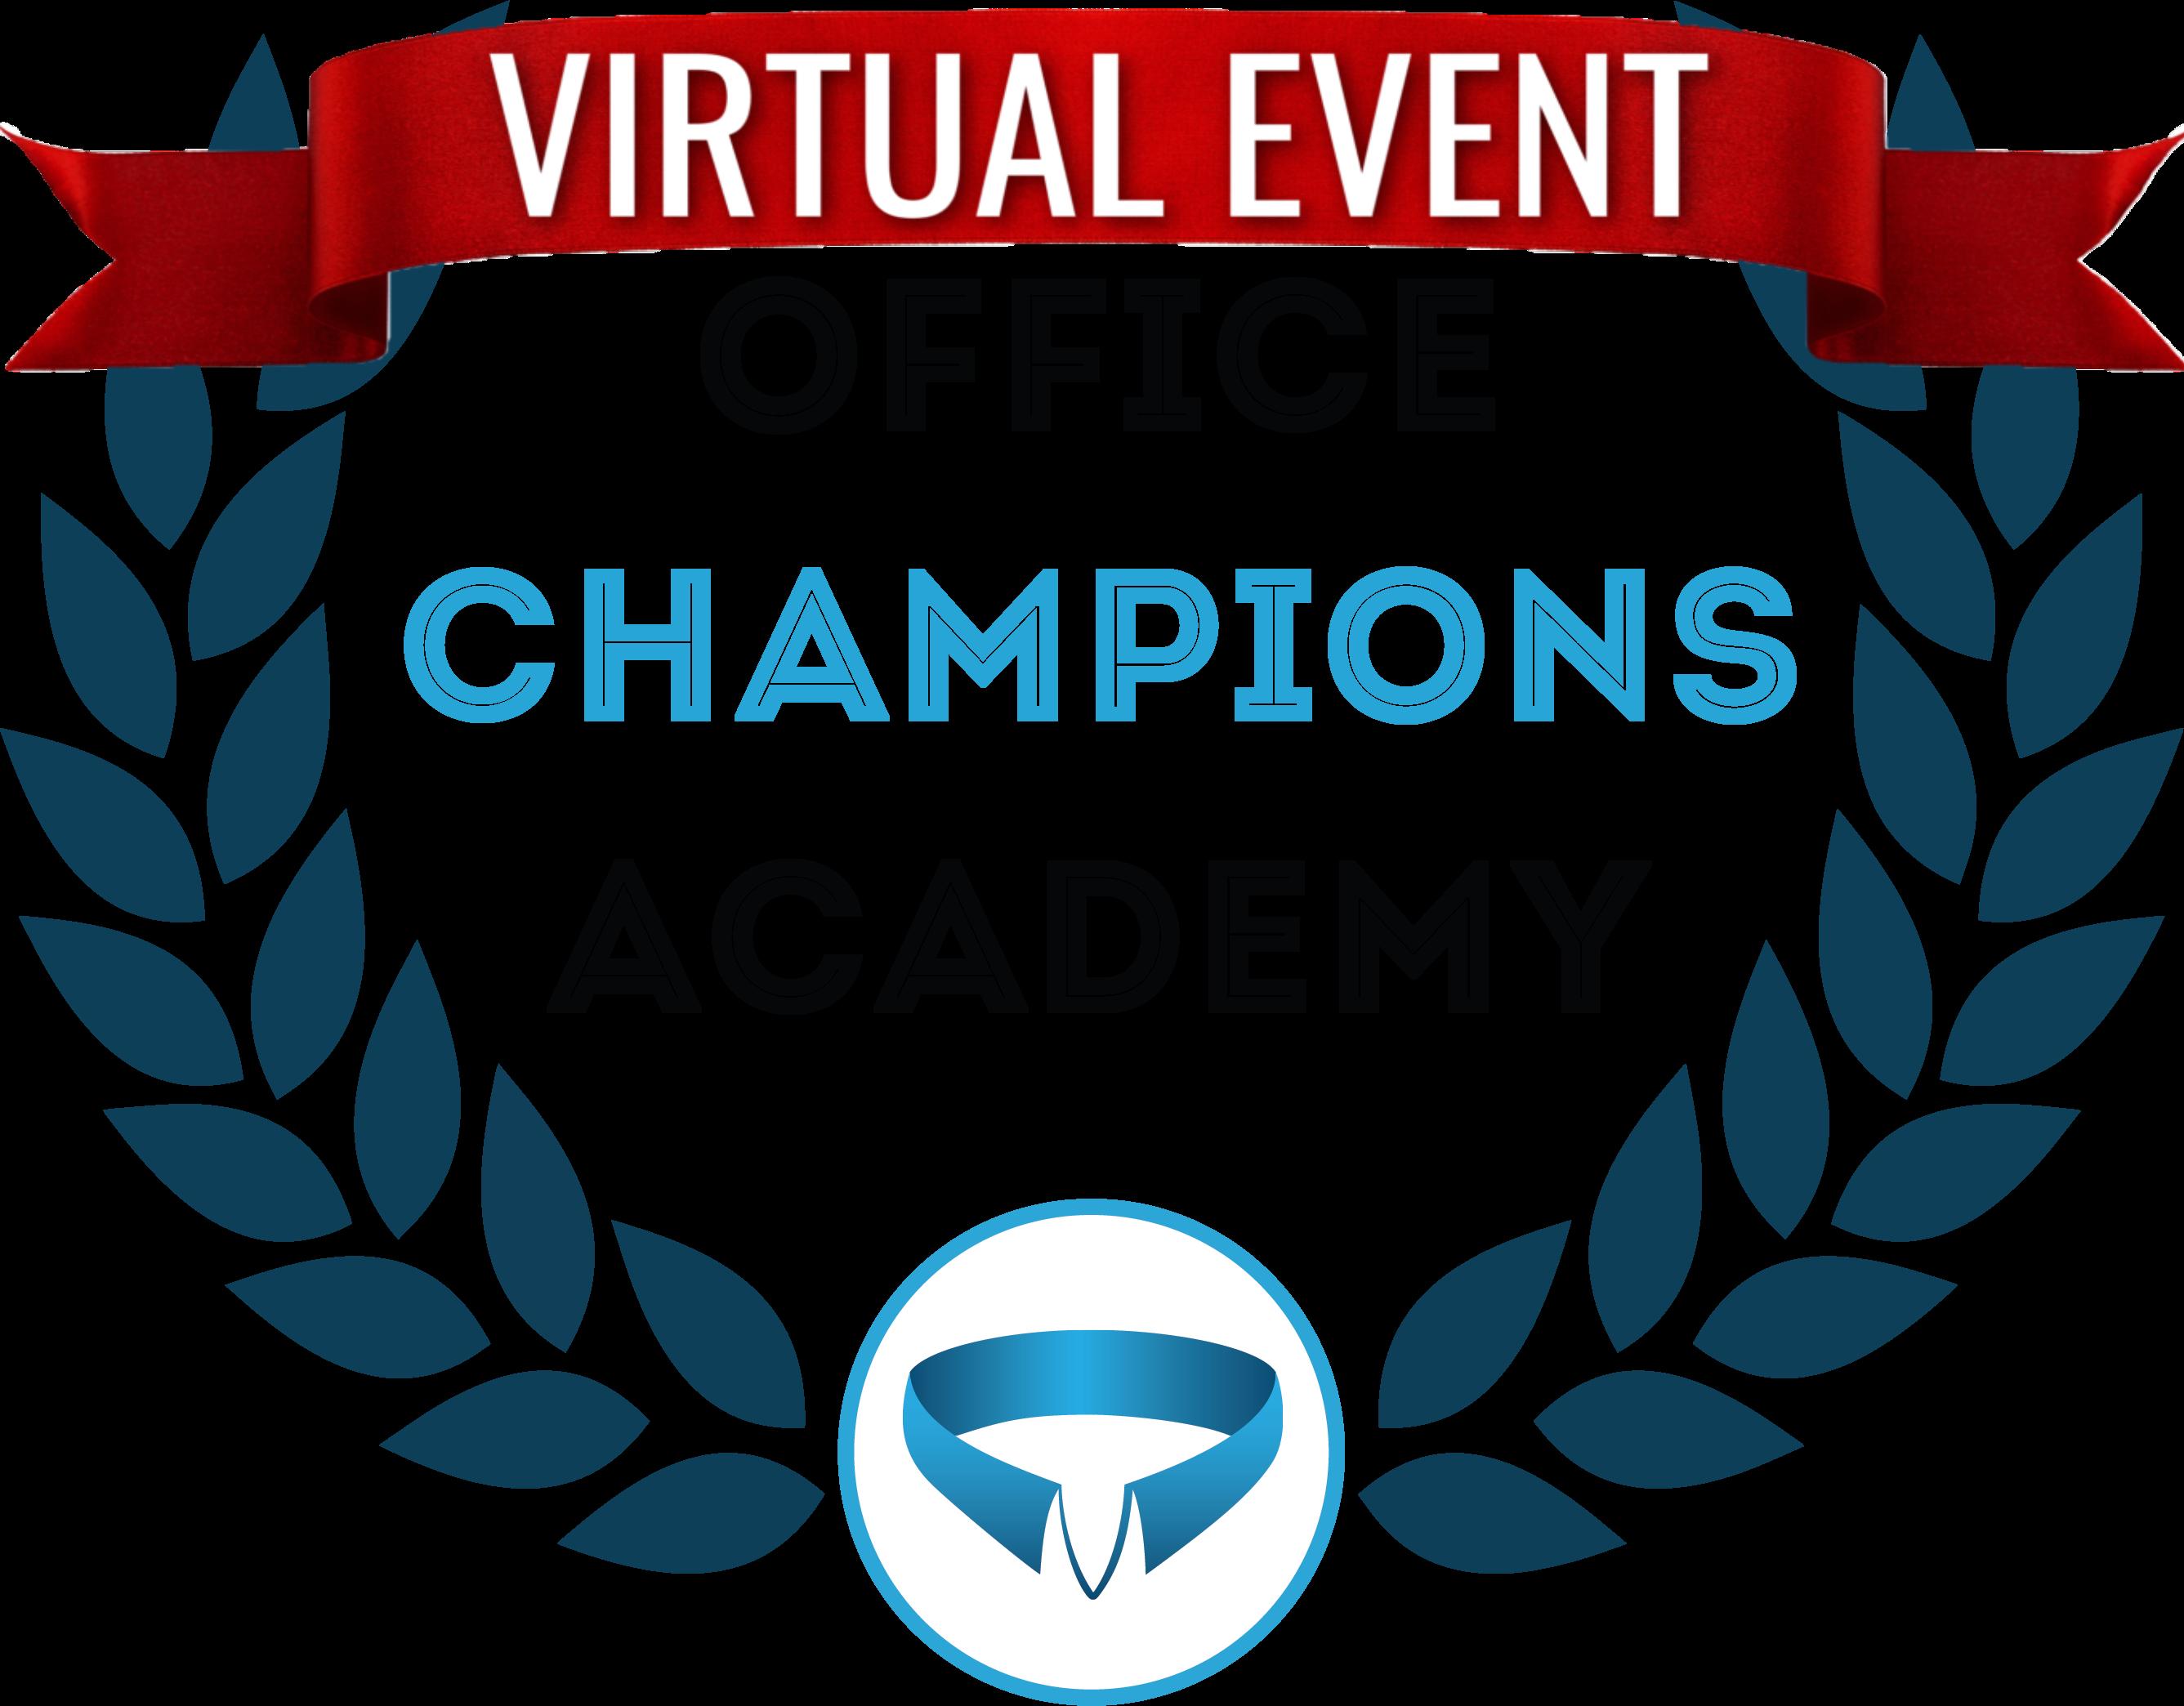 Office-Champions-Academy-Logo-Black-Text-White-Circle-Virtual (2)